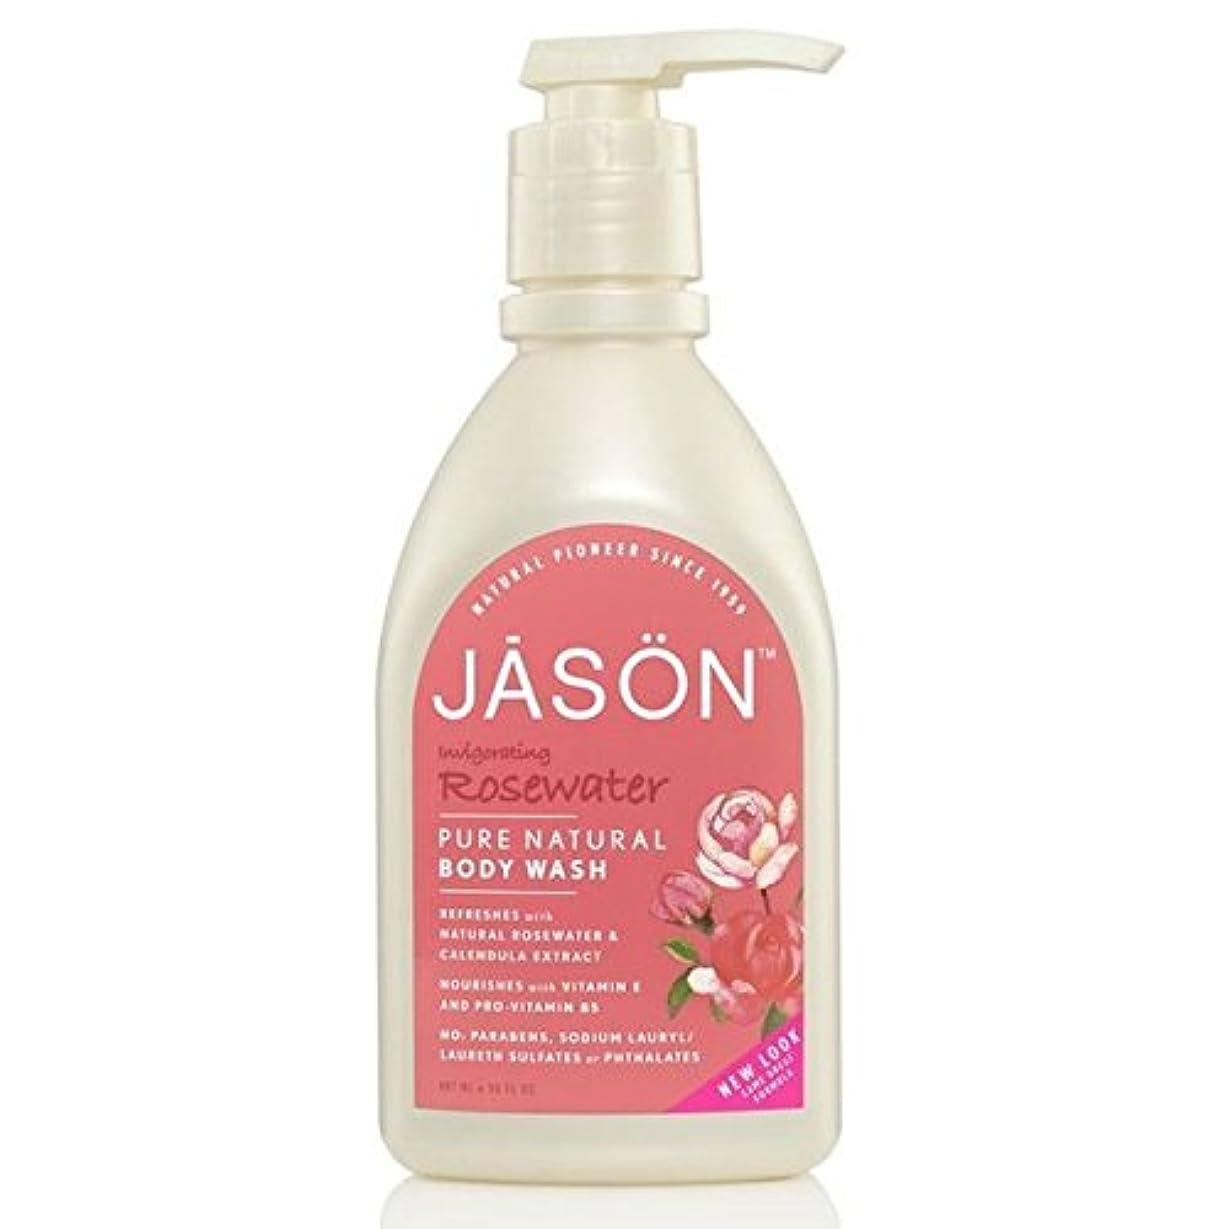 Jason Body Wash Rosewater Satin Shower 900ml - ジェイソン?ボディウォッシュローズウォーターサテンシャワー900ミリリットル [並行輸入品]